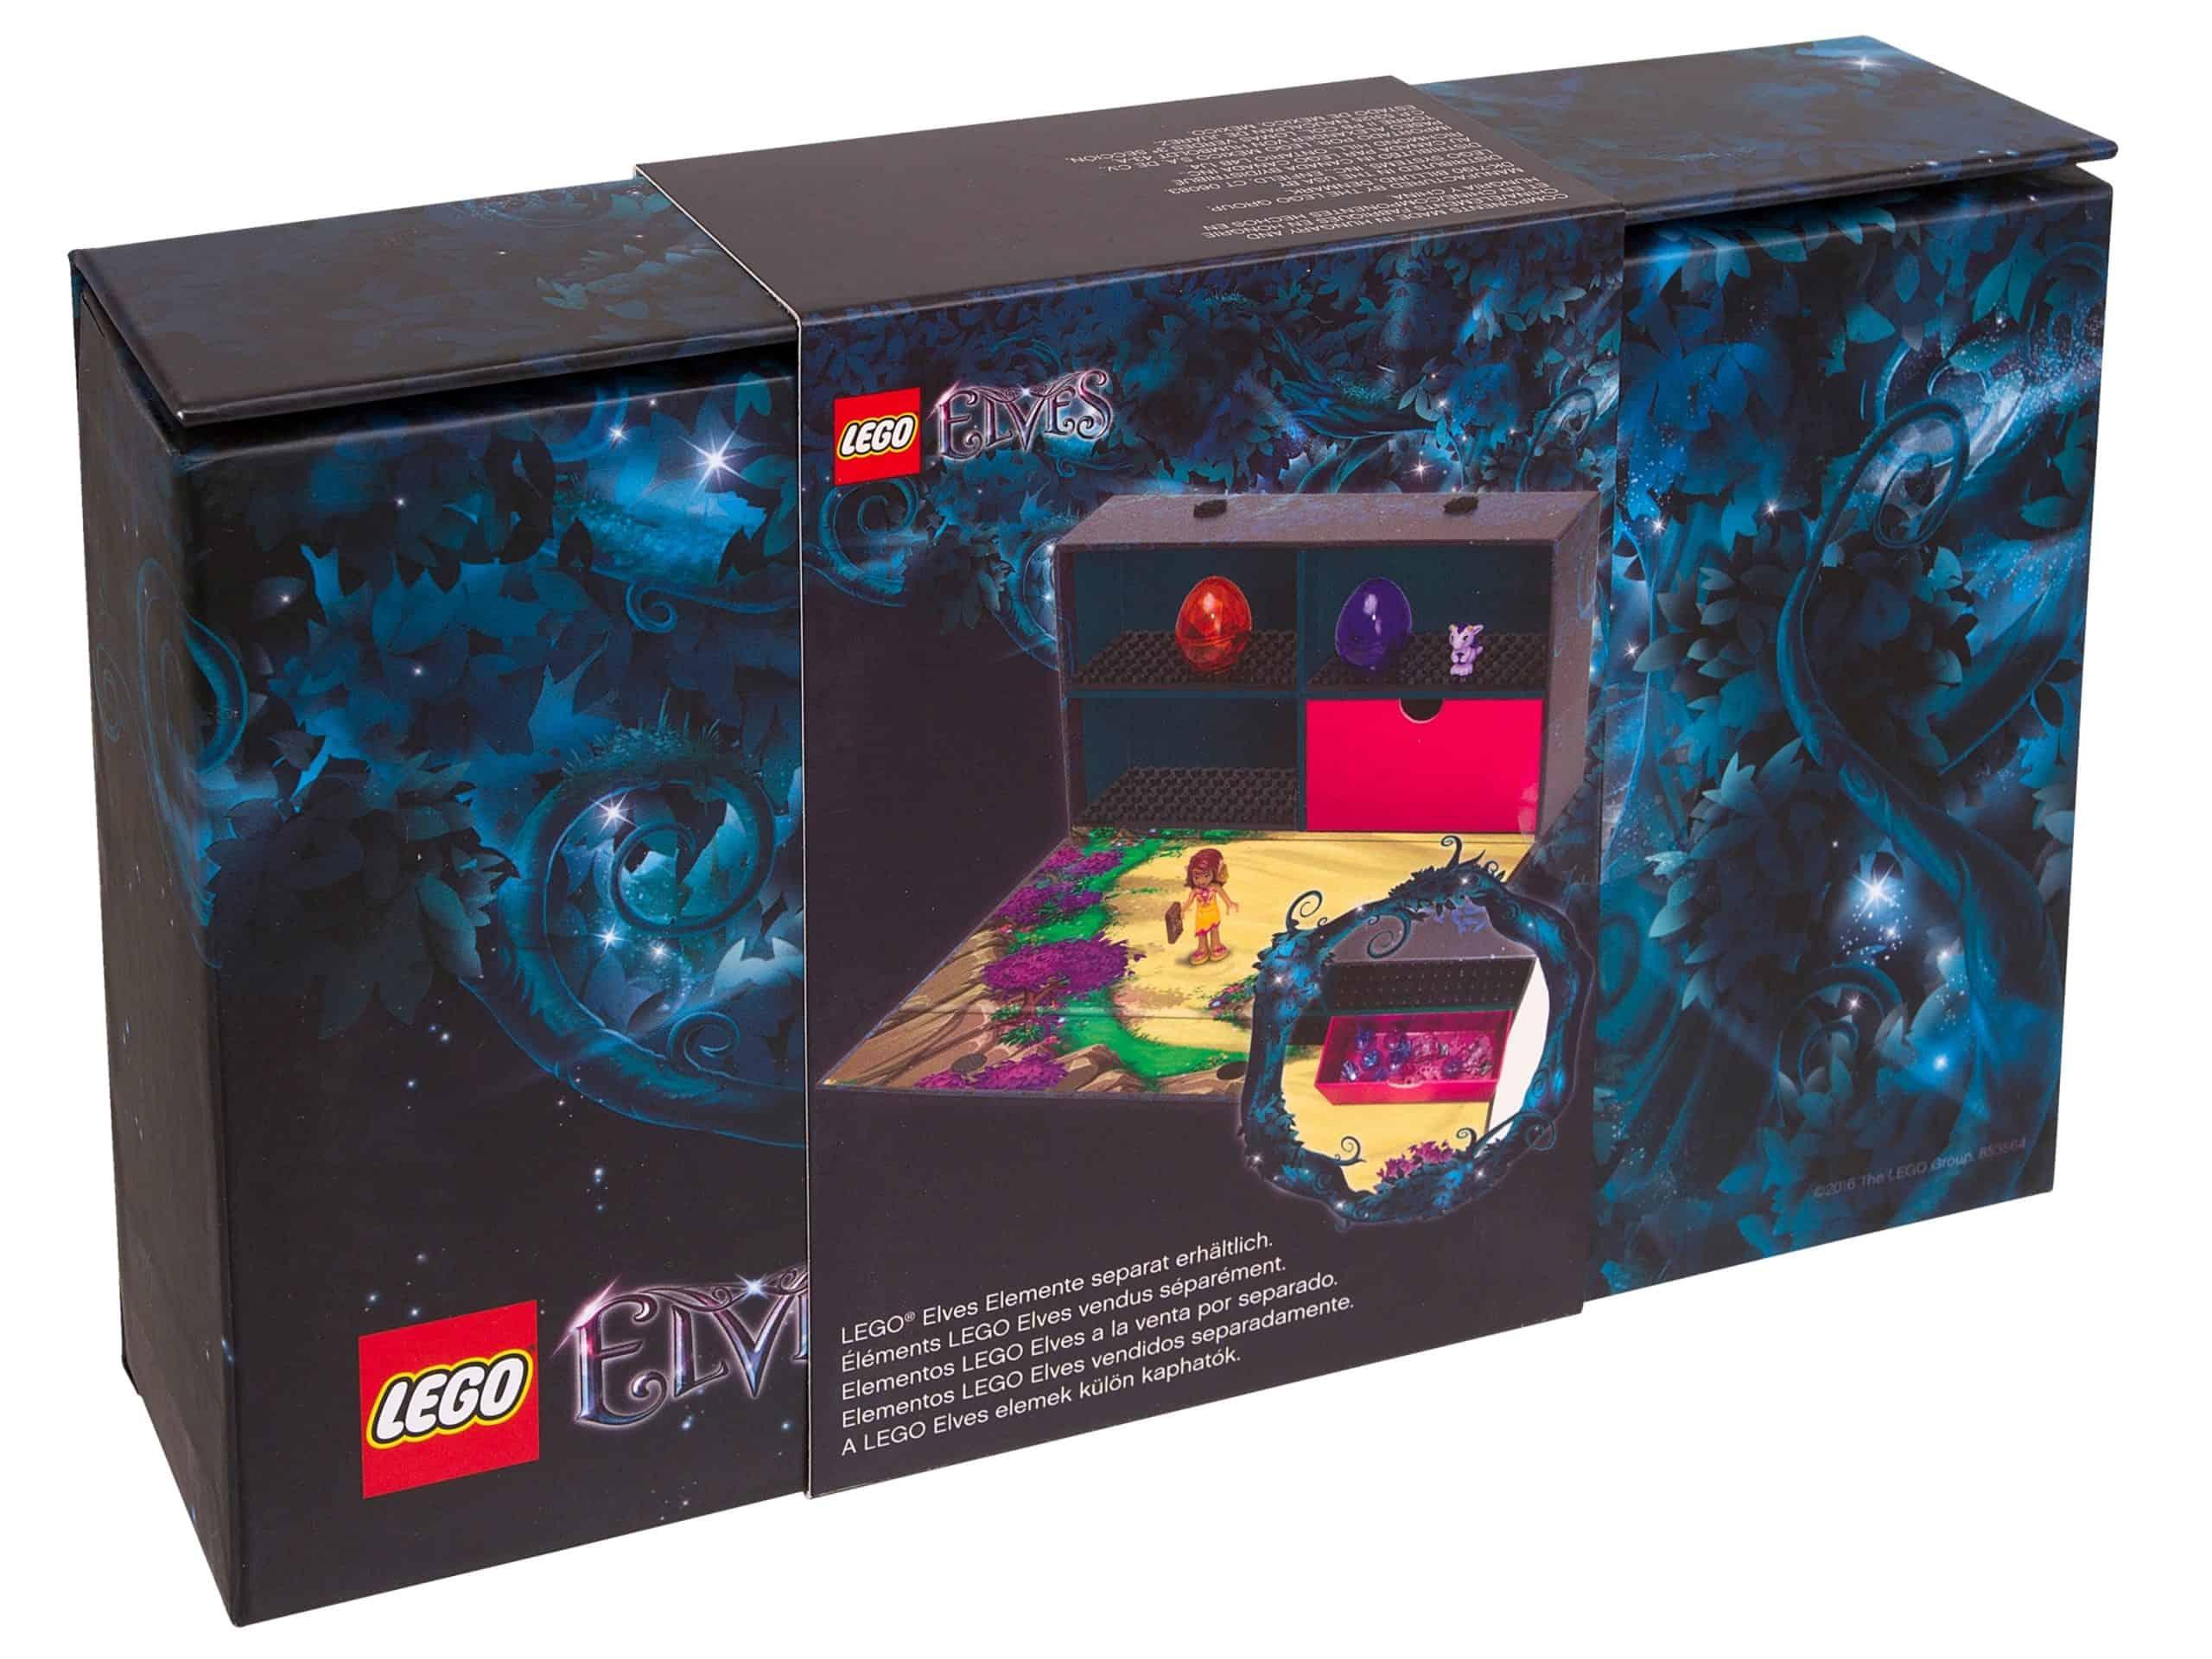 853564 official lego 853564 shop se scaled